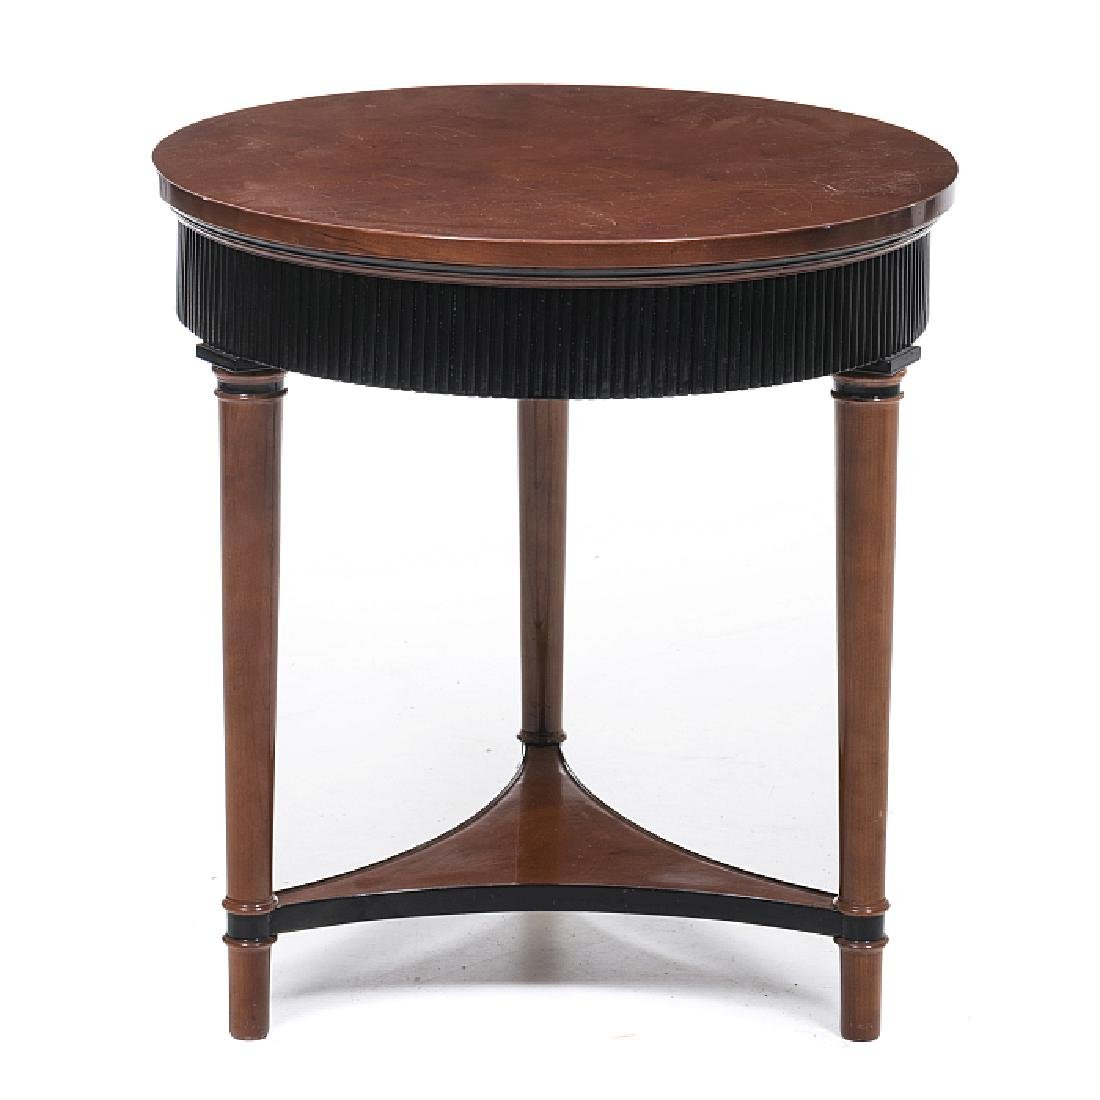 Biedermeier support table